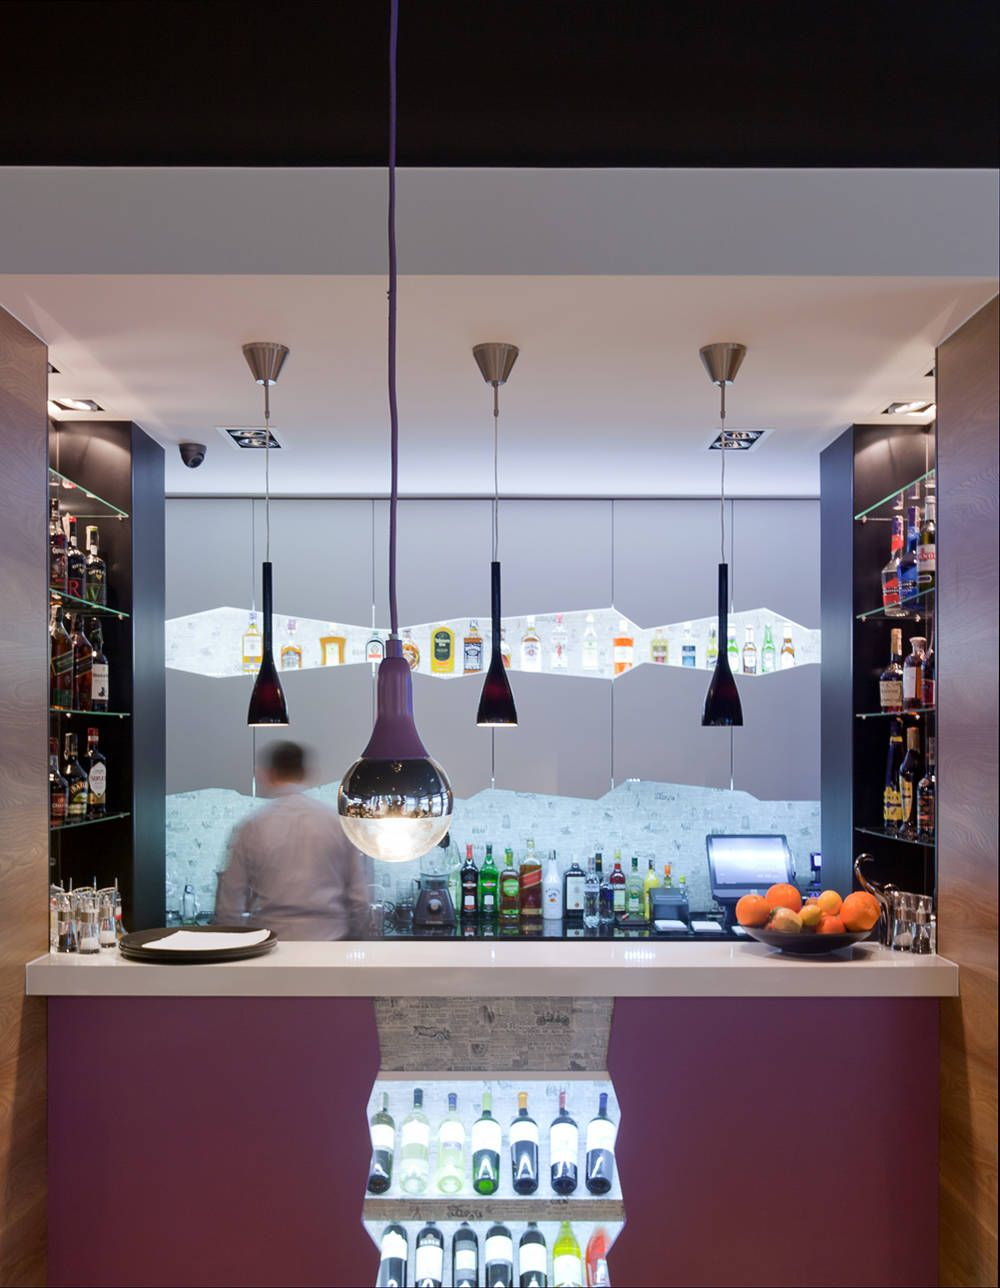 warmhouse #paper #interior #bar #counter #cafe #restaurant #purple